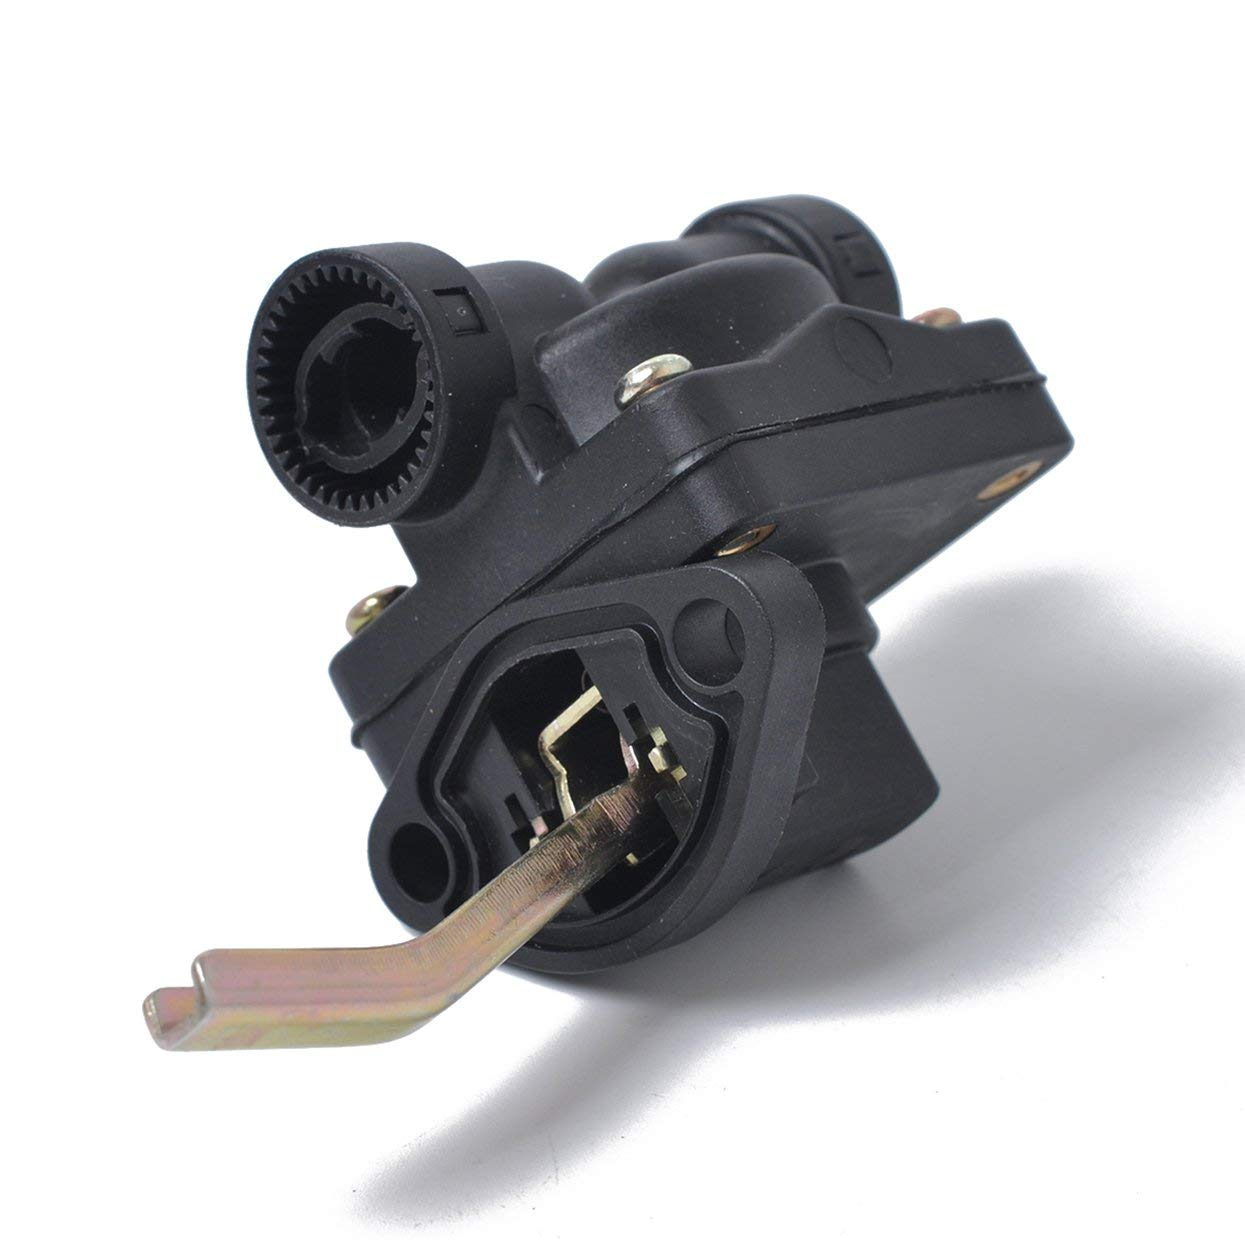 Lamijca Fuel Pump Kit for Kohler 5255903-S KT17 KT19 M18 M20 MV16 MV16 MV18 MV20 Engines Lightweight Vehicle Accessories